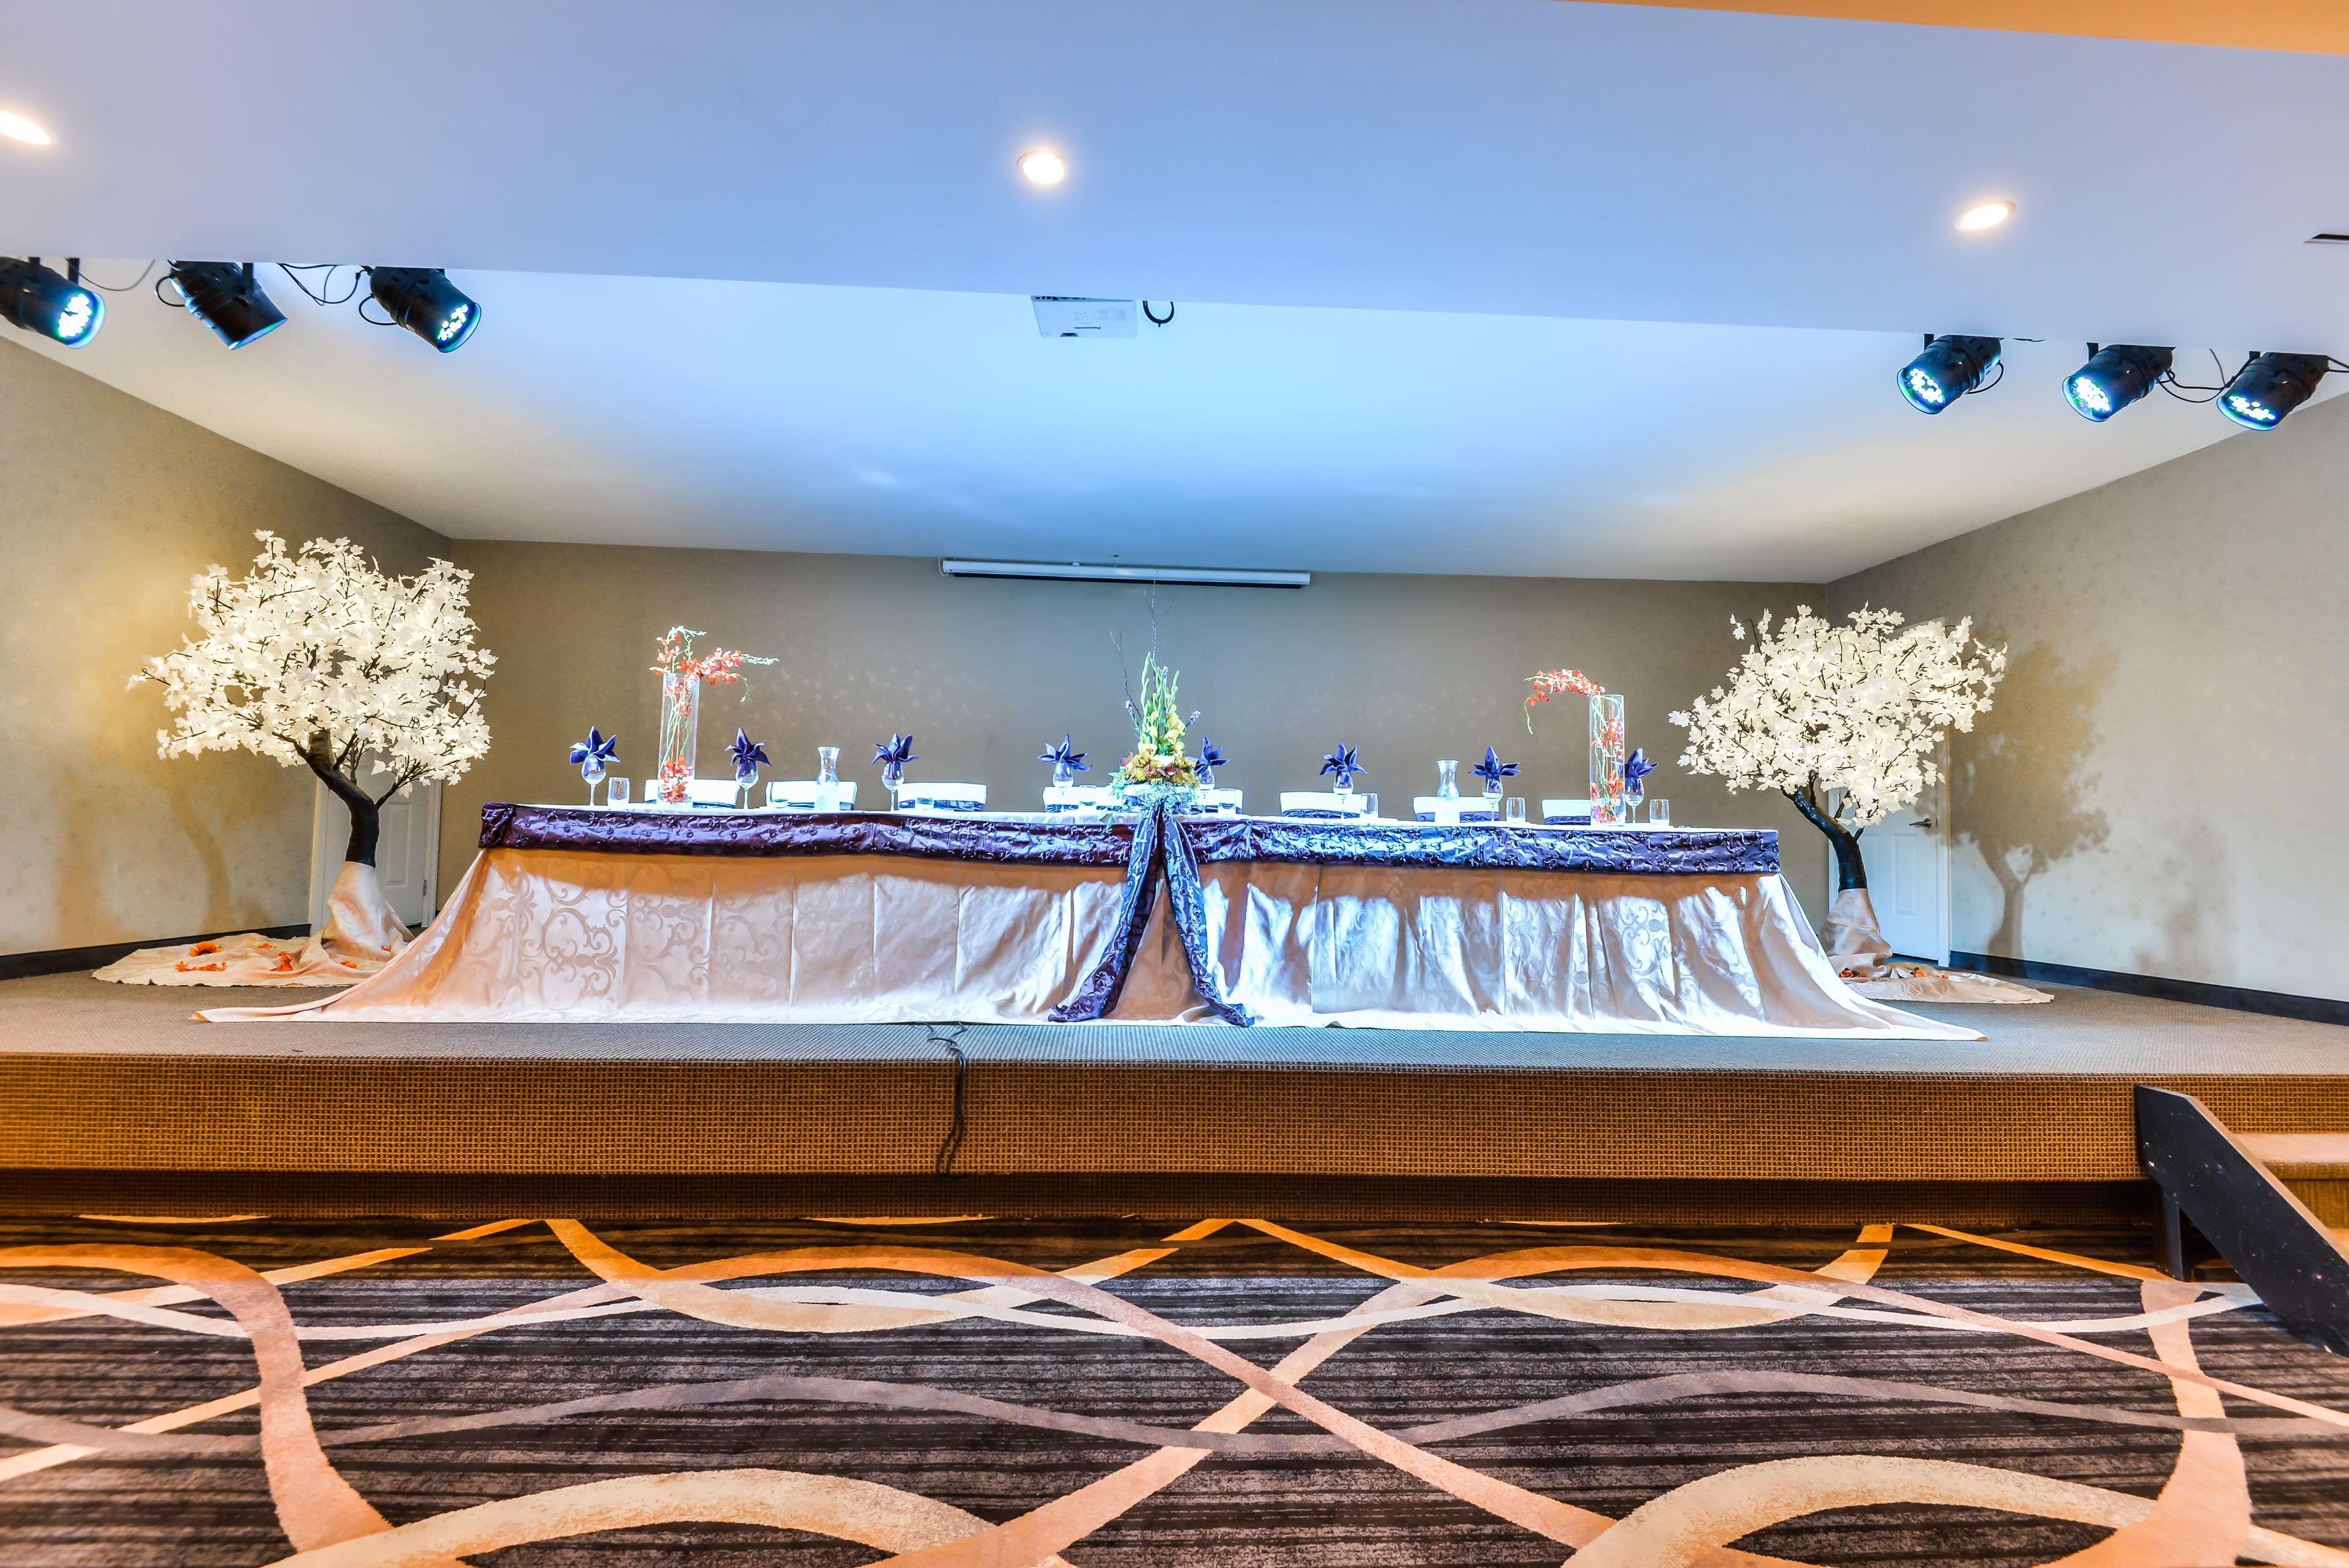 Head table Best Western Plus Leamington Hotel & Conference Centre Leamington (519)326-8646